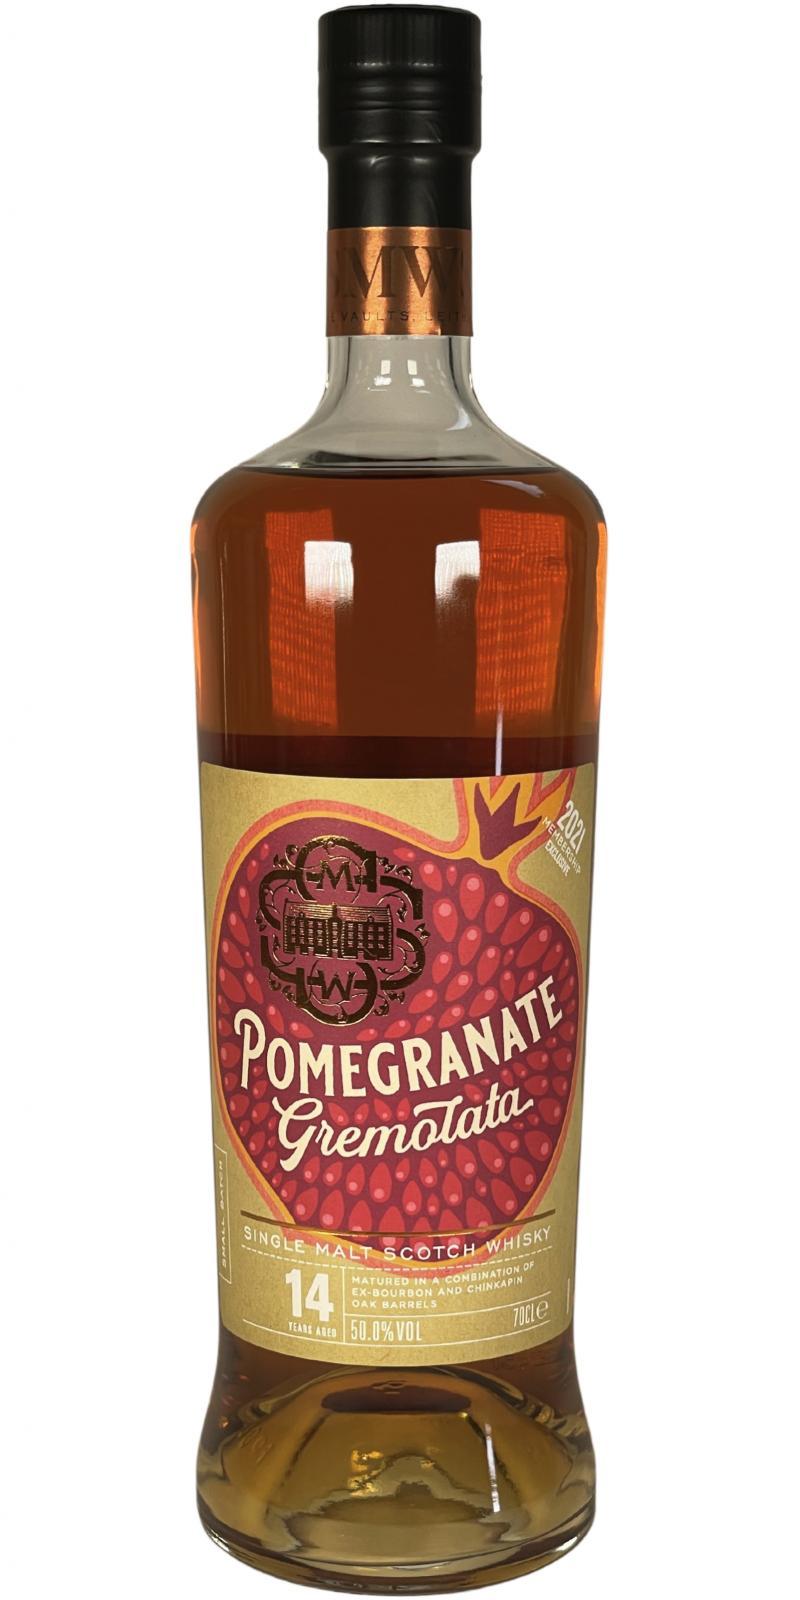 Single Malt Whisky 2006 Pomegranate Gremolata SMWS